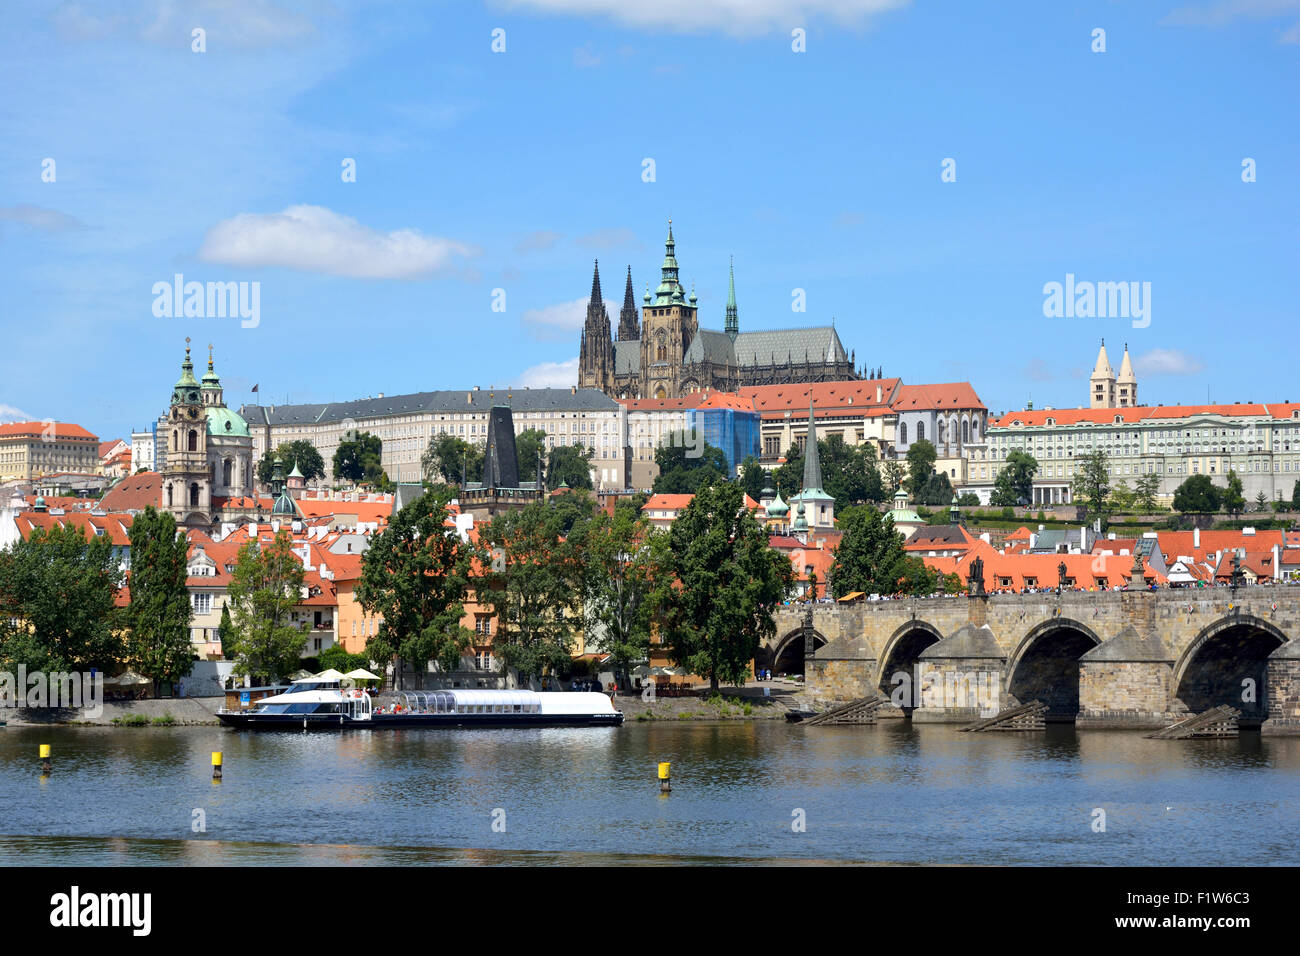 Hradcany castle and the Charles bridge at the Vltava river in Prague. - Stock Image